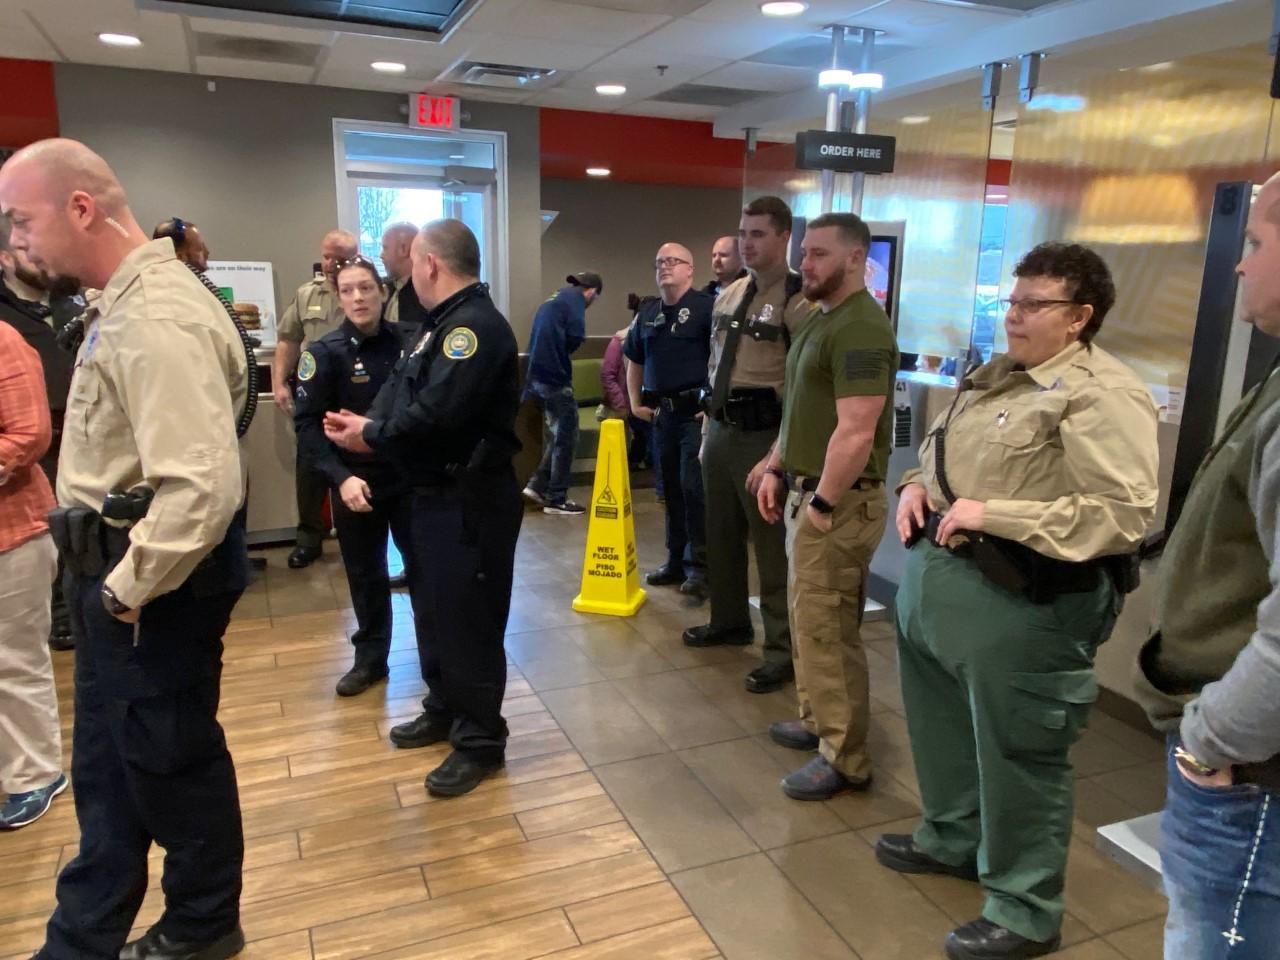 Law enforcement officers at McDonald's